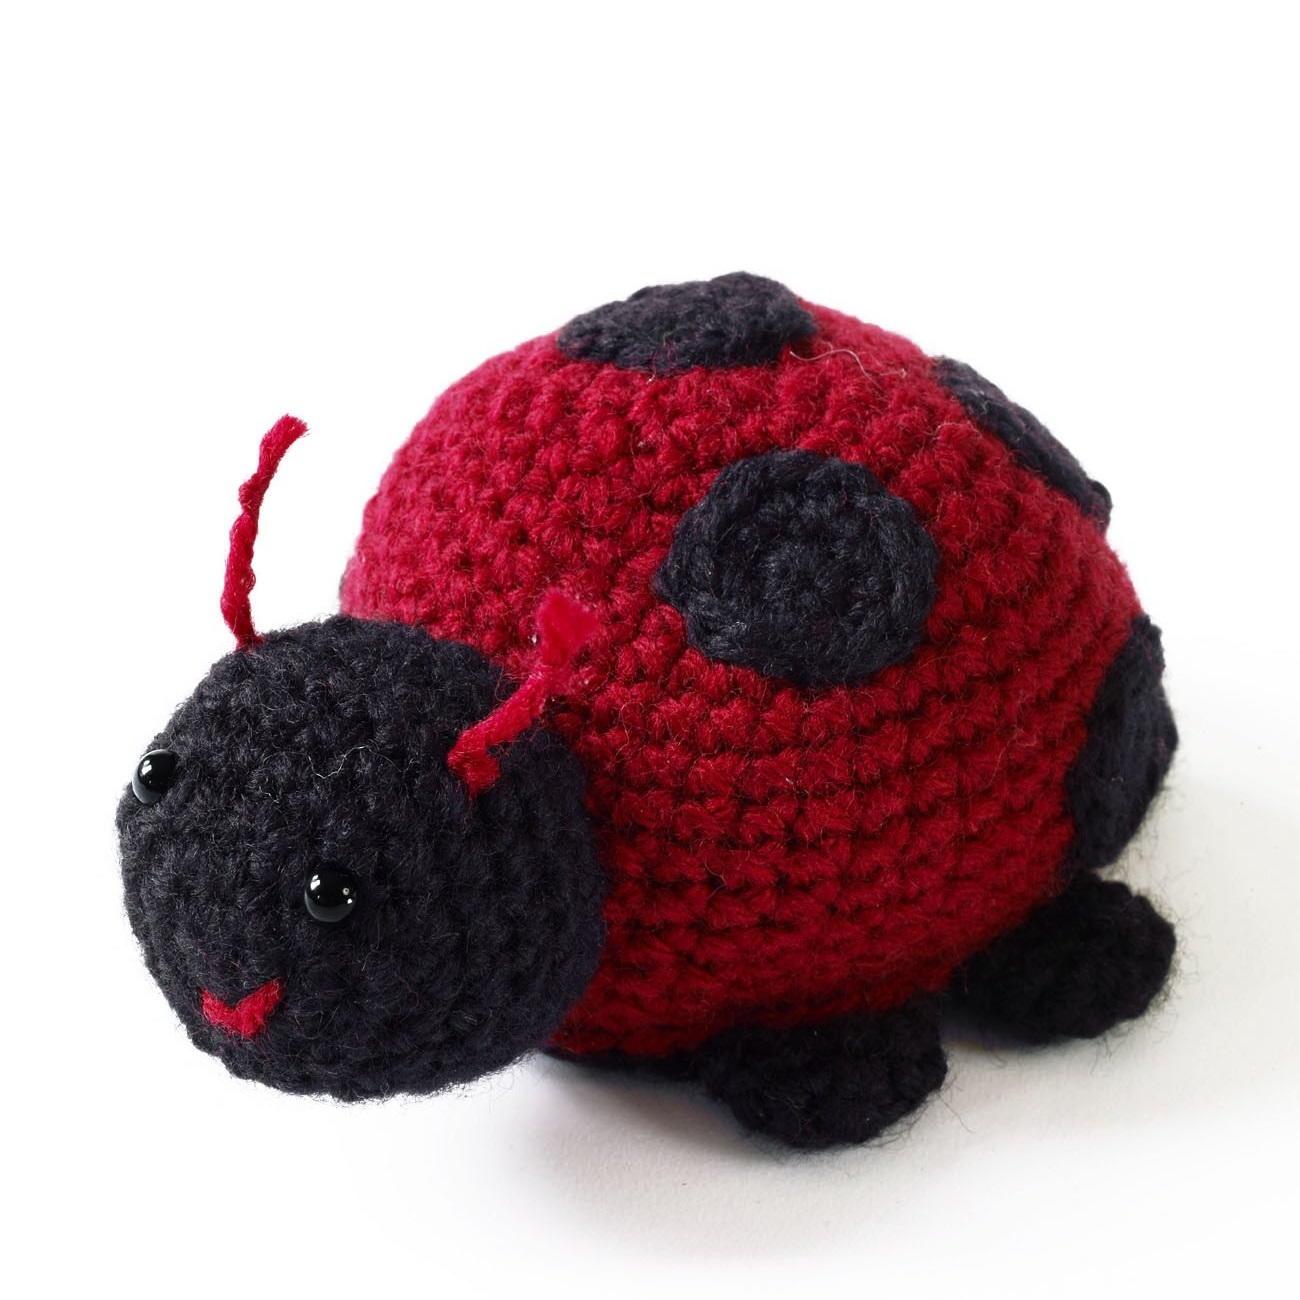 Crochet Pattern Doll in a Ladybug outfit Amigurumi (LittleOwlsHut ... | 1300x1300